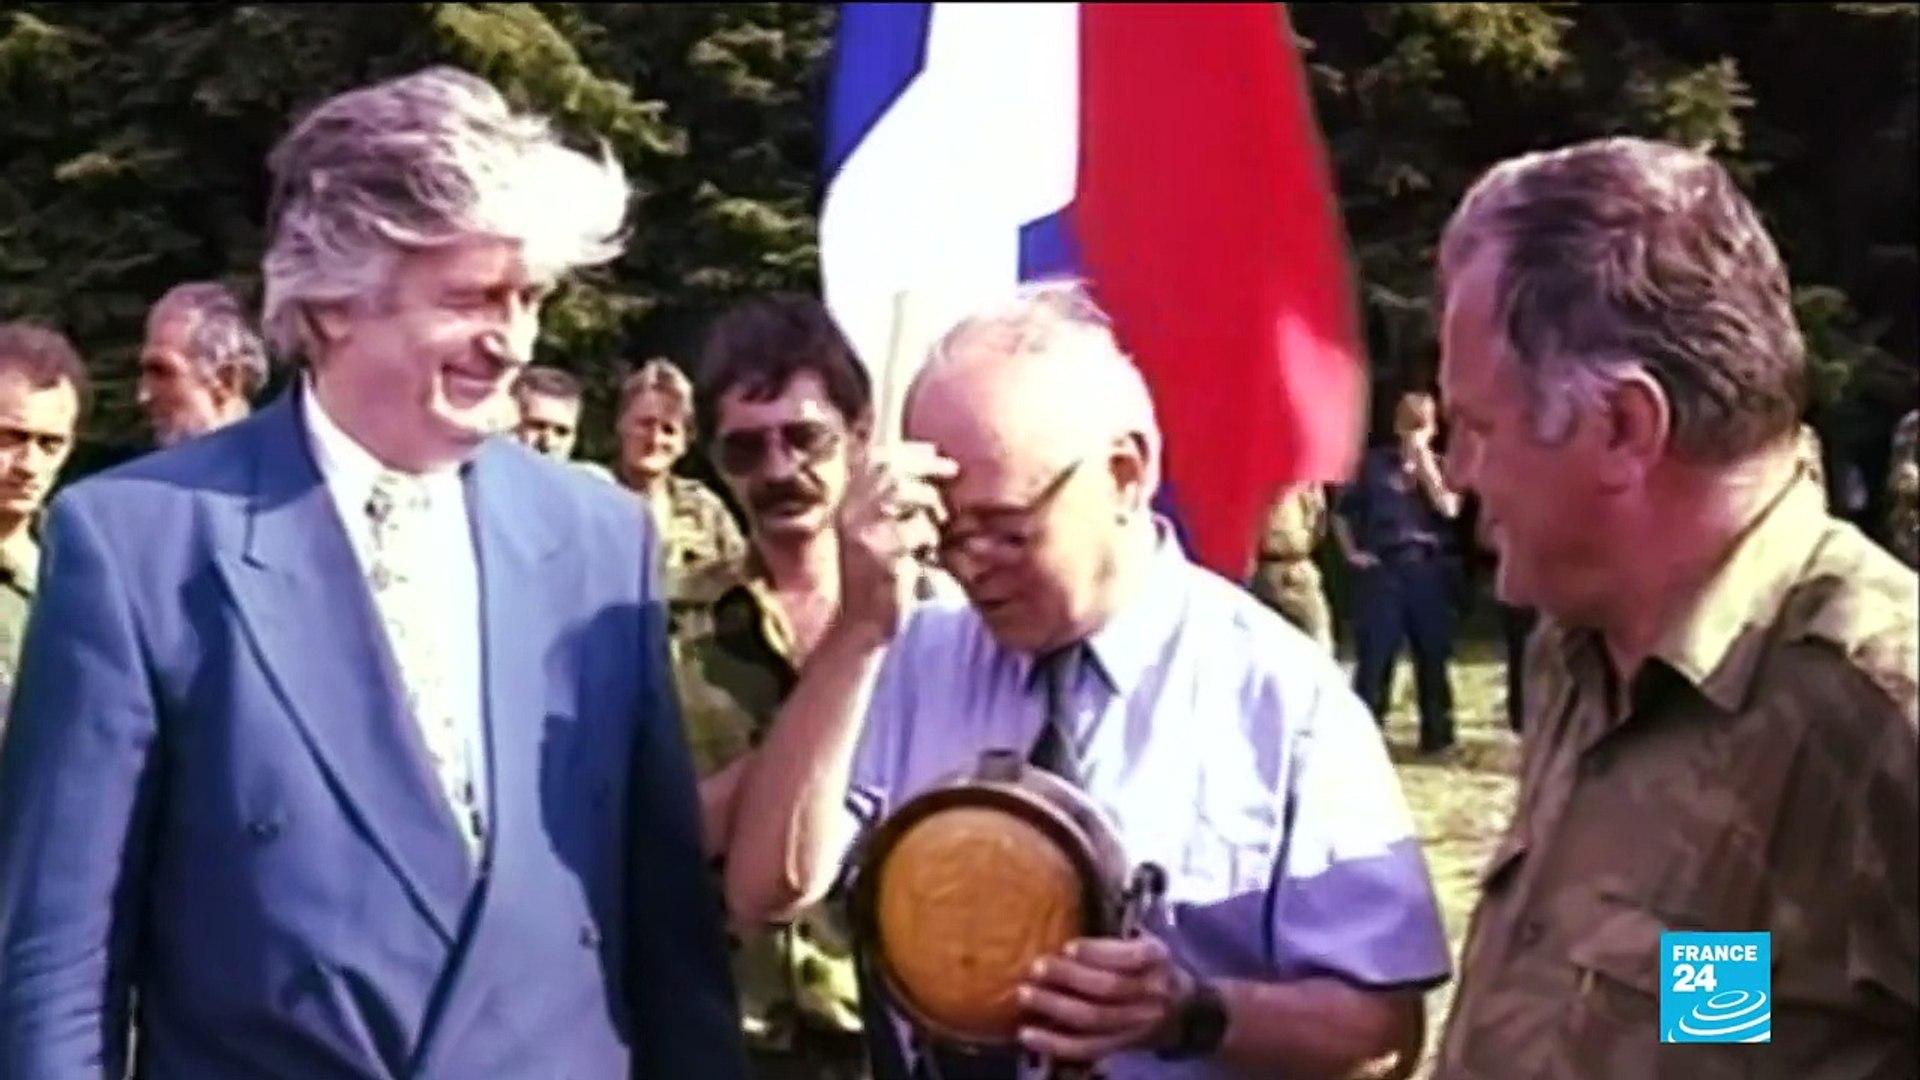 Ex-Bosnian Serb leader Radovan Karadzic in court for final war crimes verdict